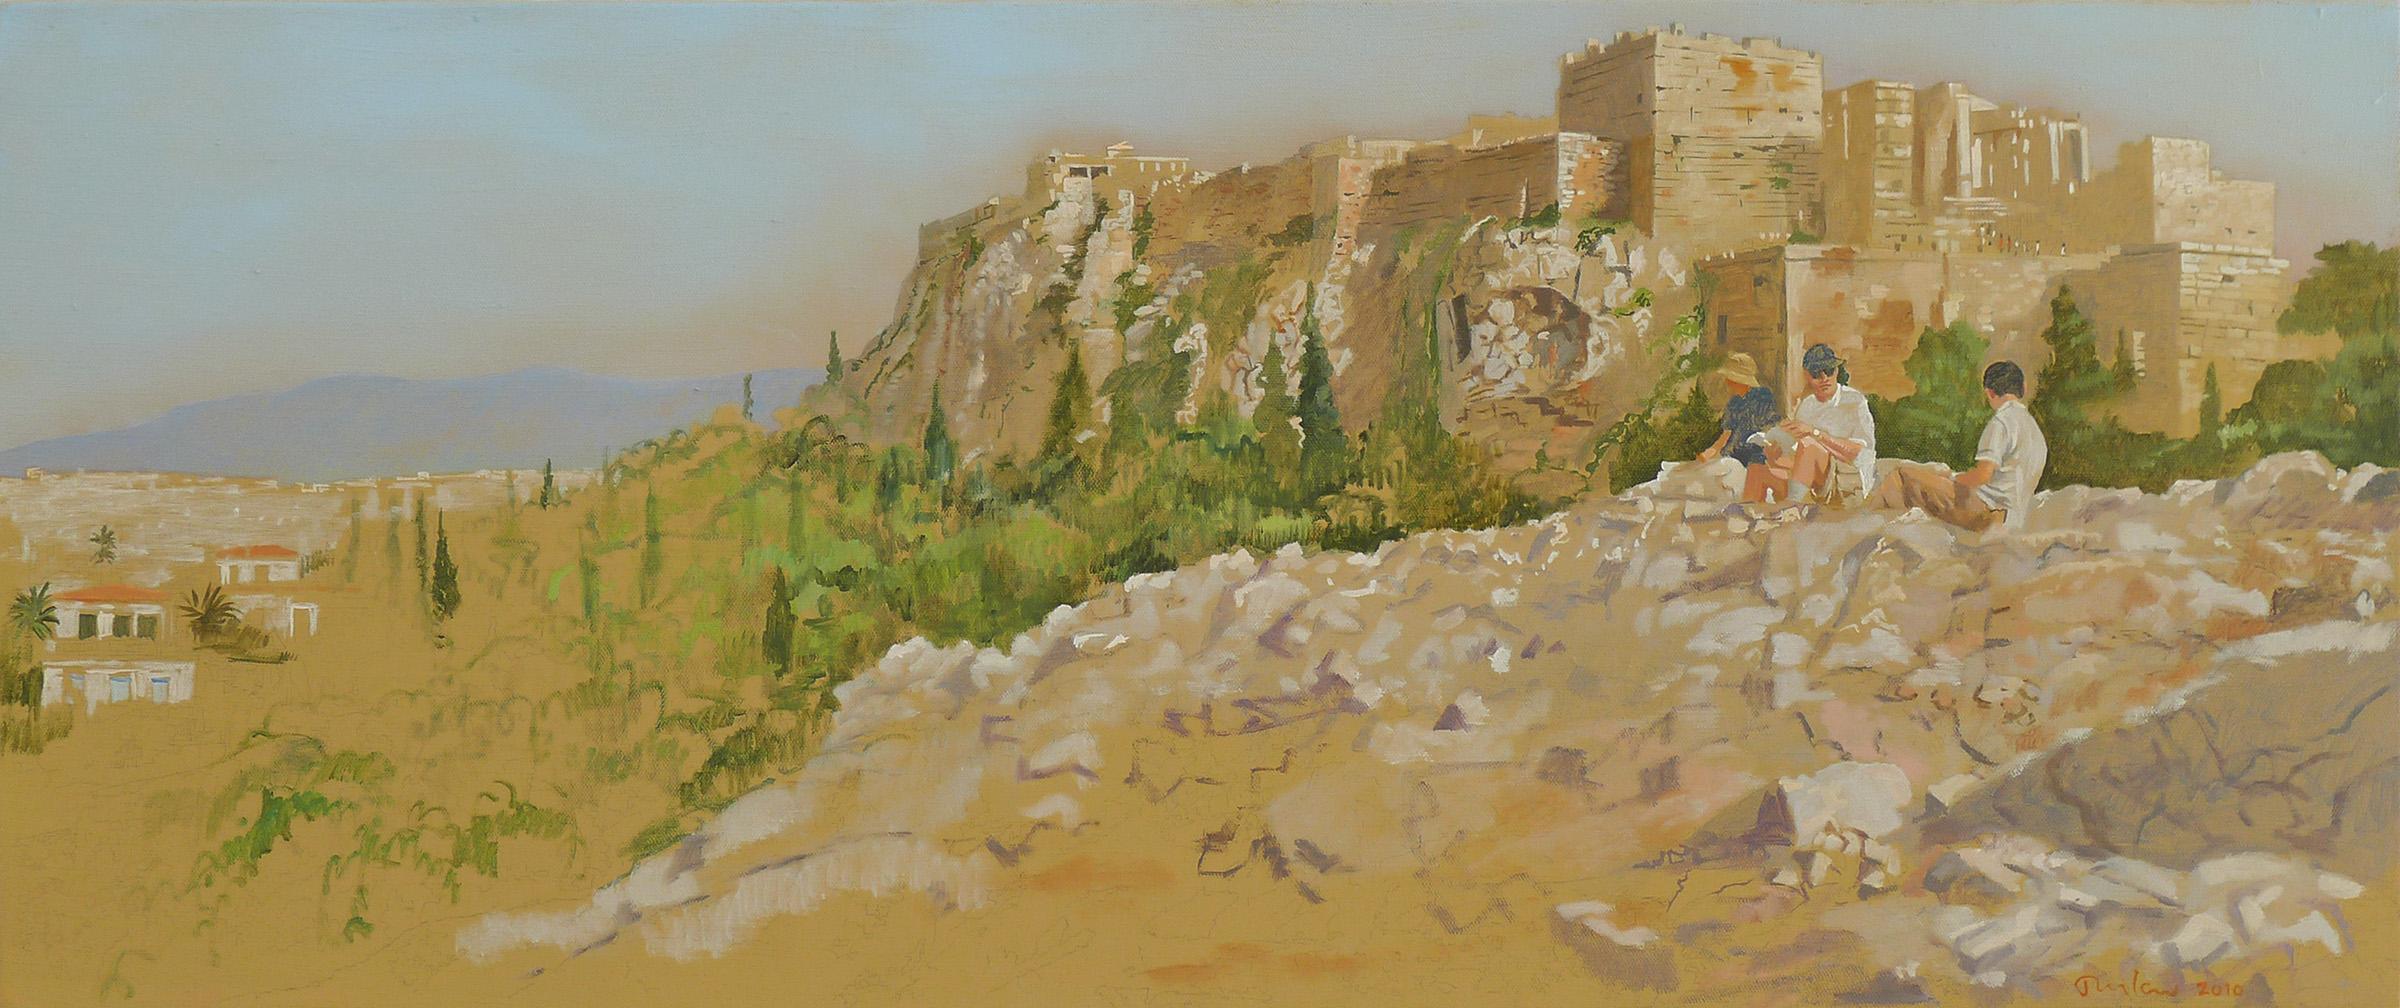 December Morning, Acropolis 35x72%22 oil on linen copy copy.jpg